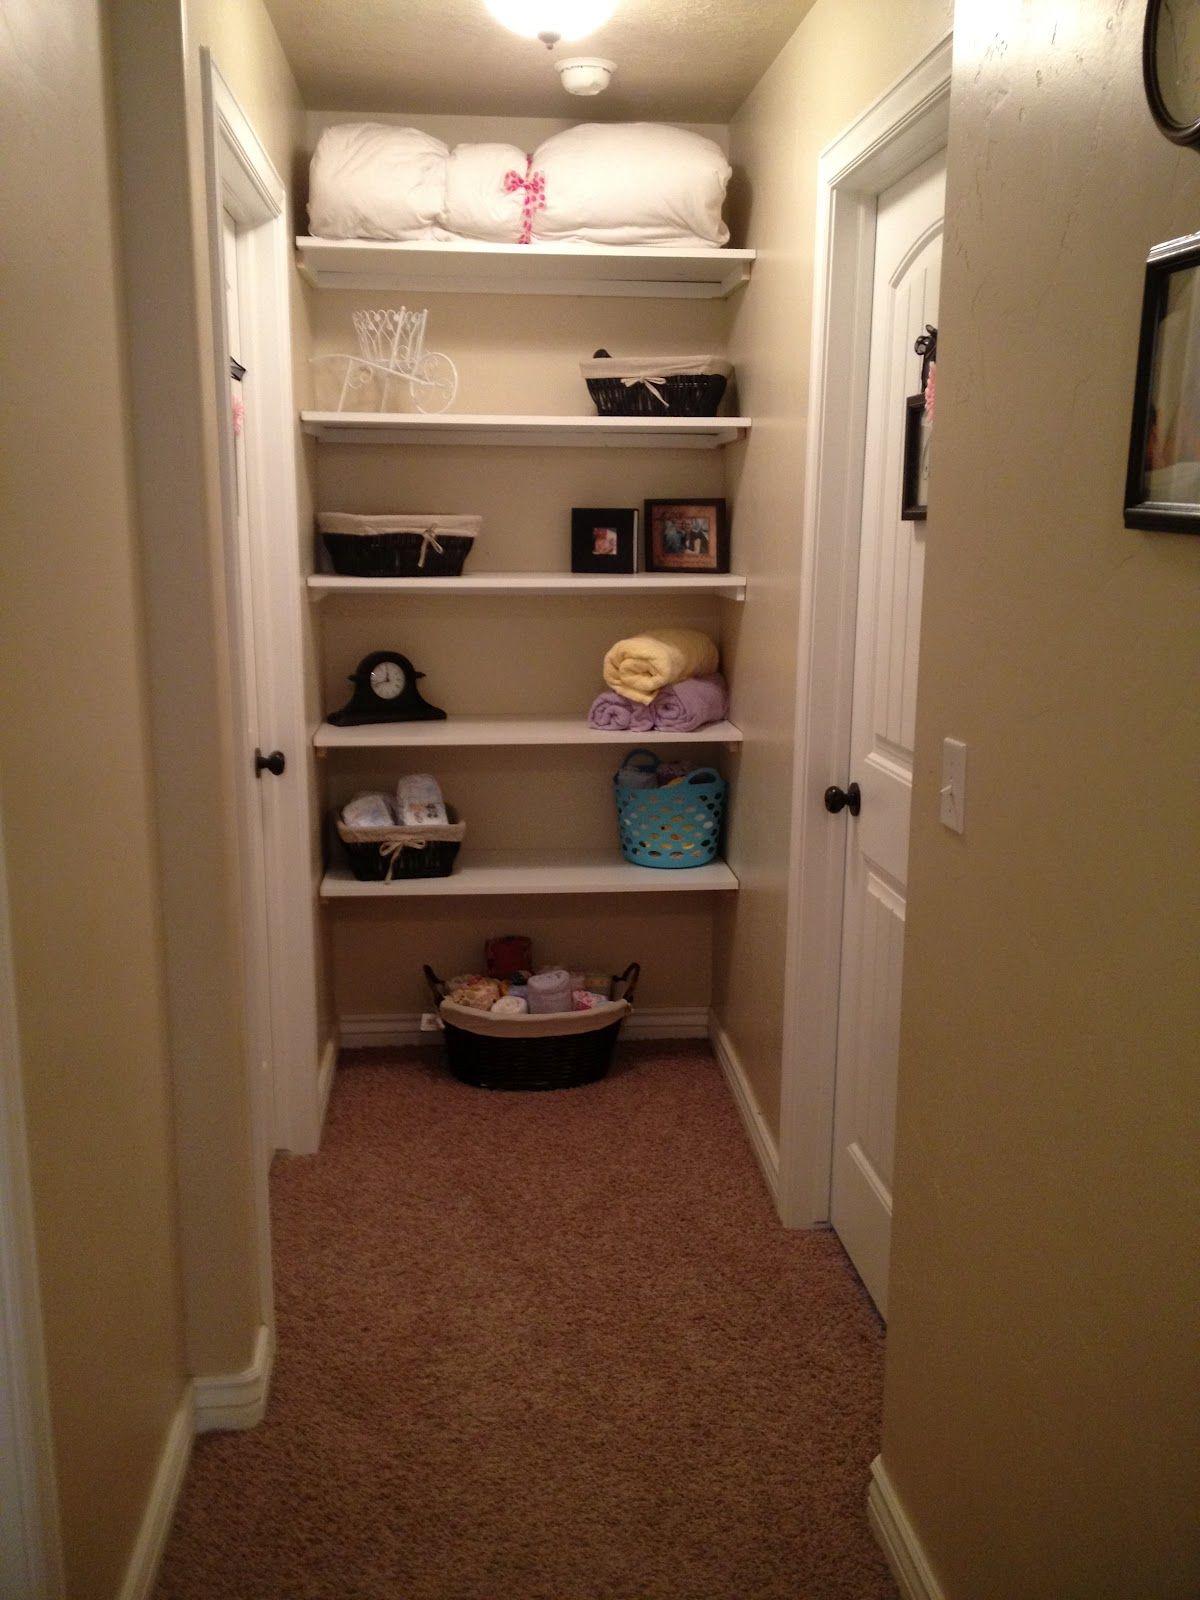 Stuff By Us Built In Shelves Open Linen Closet Tutorial Small Bathroom IdeasSmall BathroomsHallway